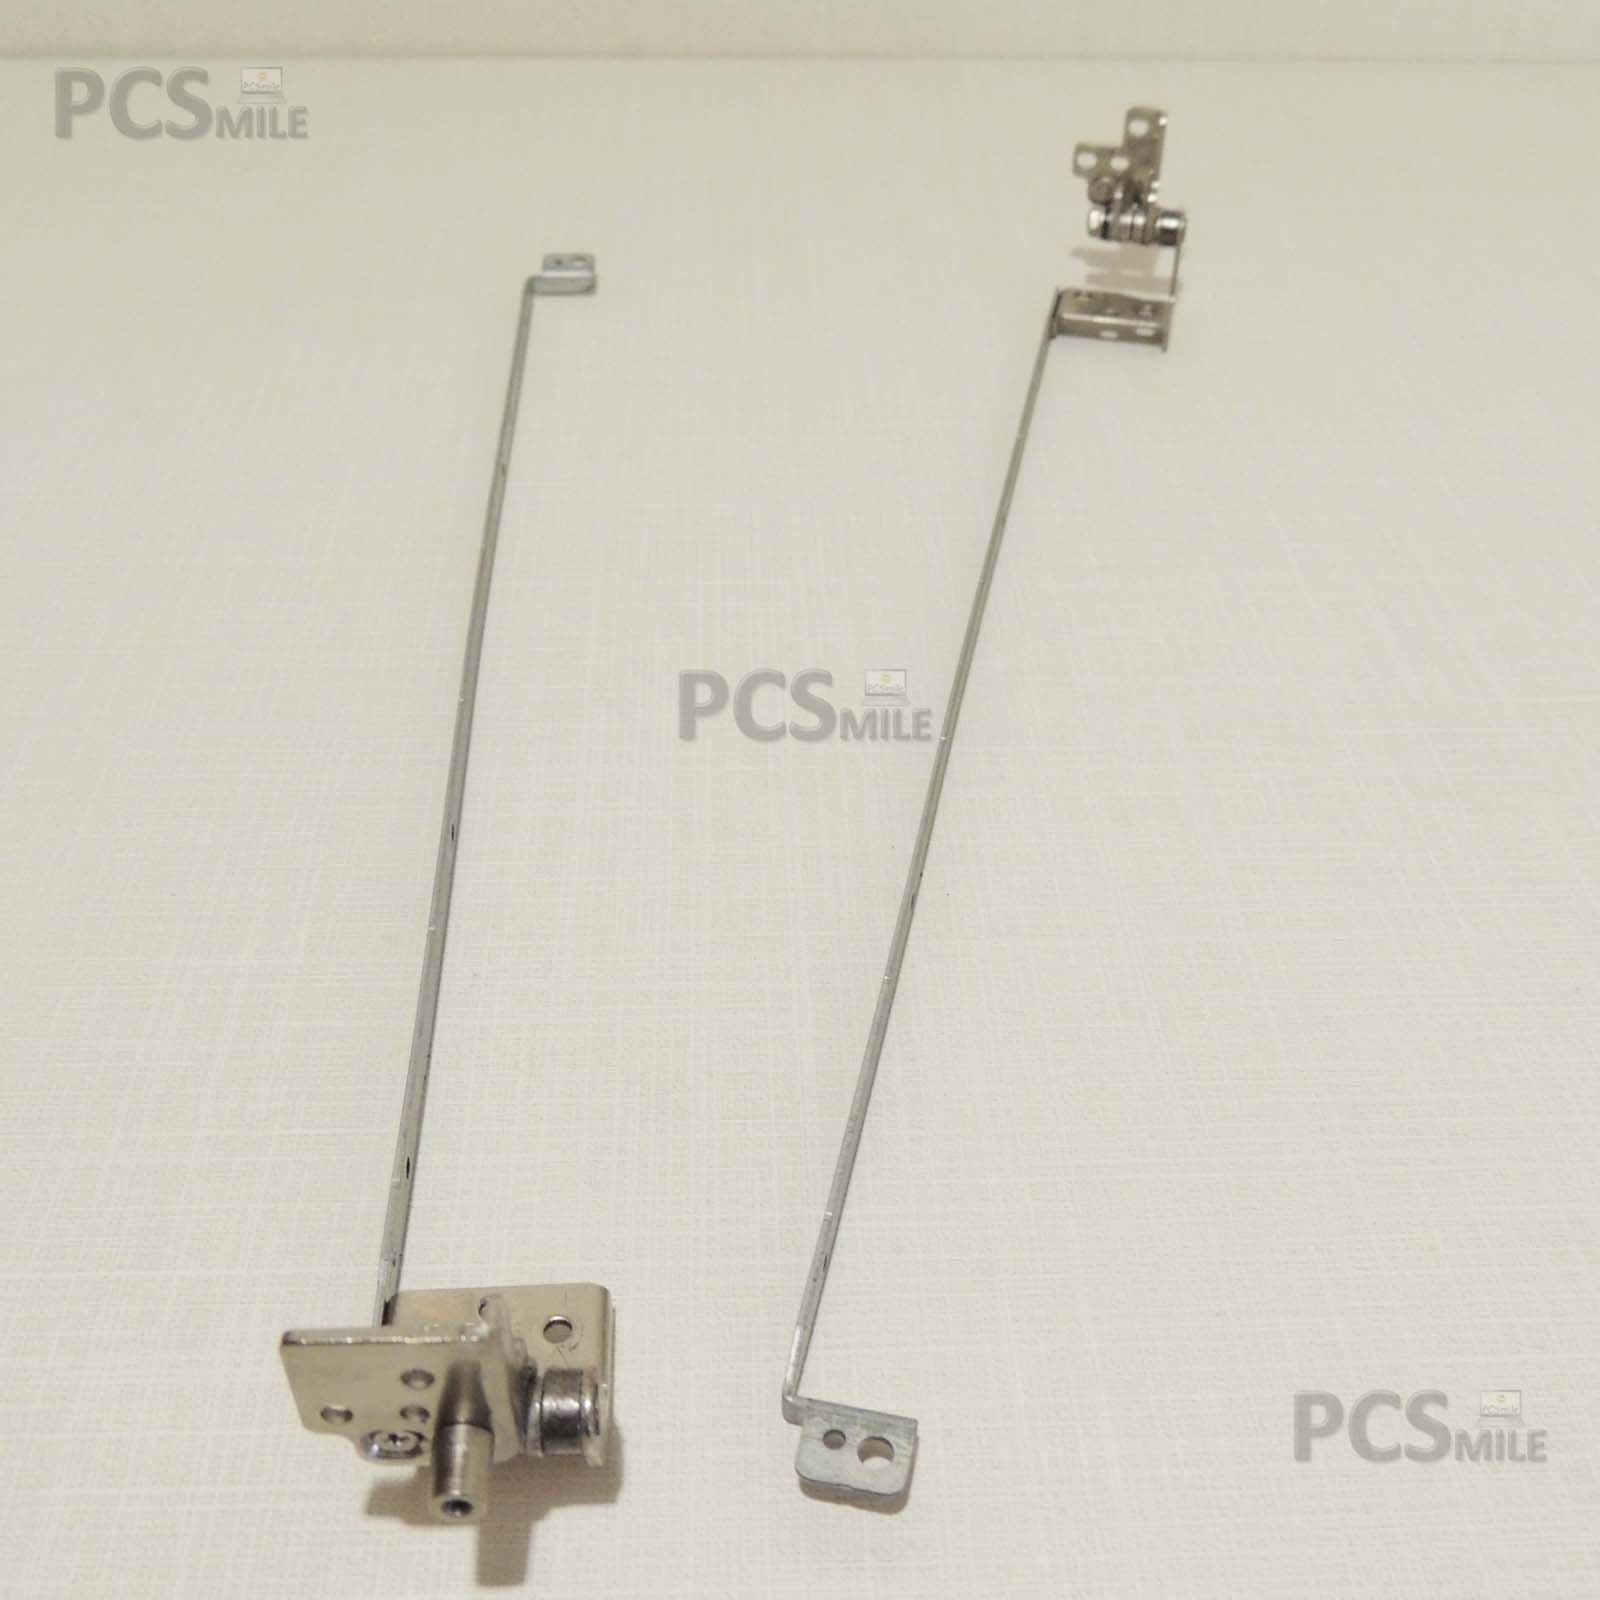 Cerniere Acer Aspire 7520 Series AM01L000501, AM01L000401 Bracket supporti LCD